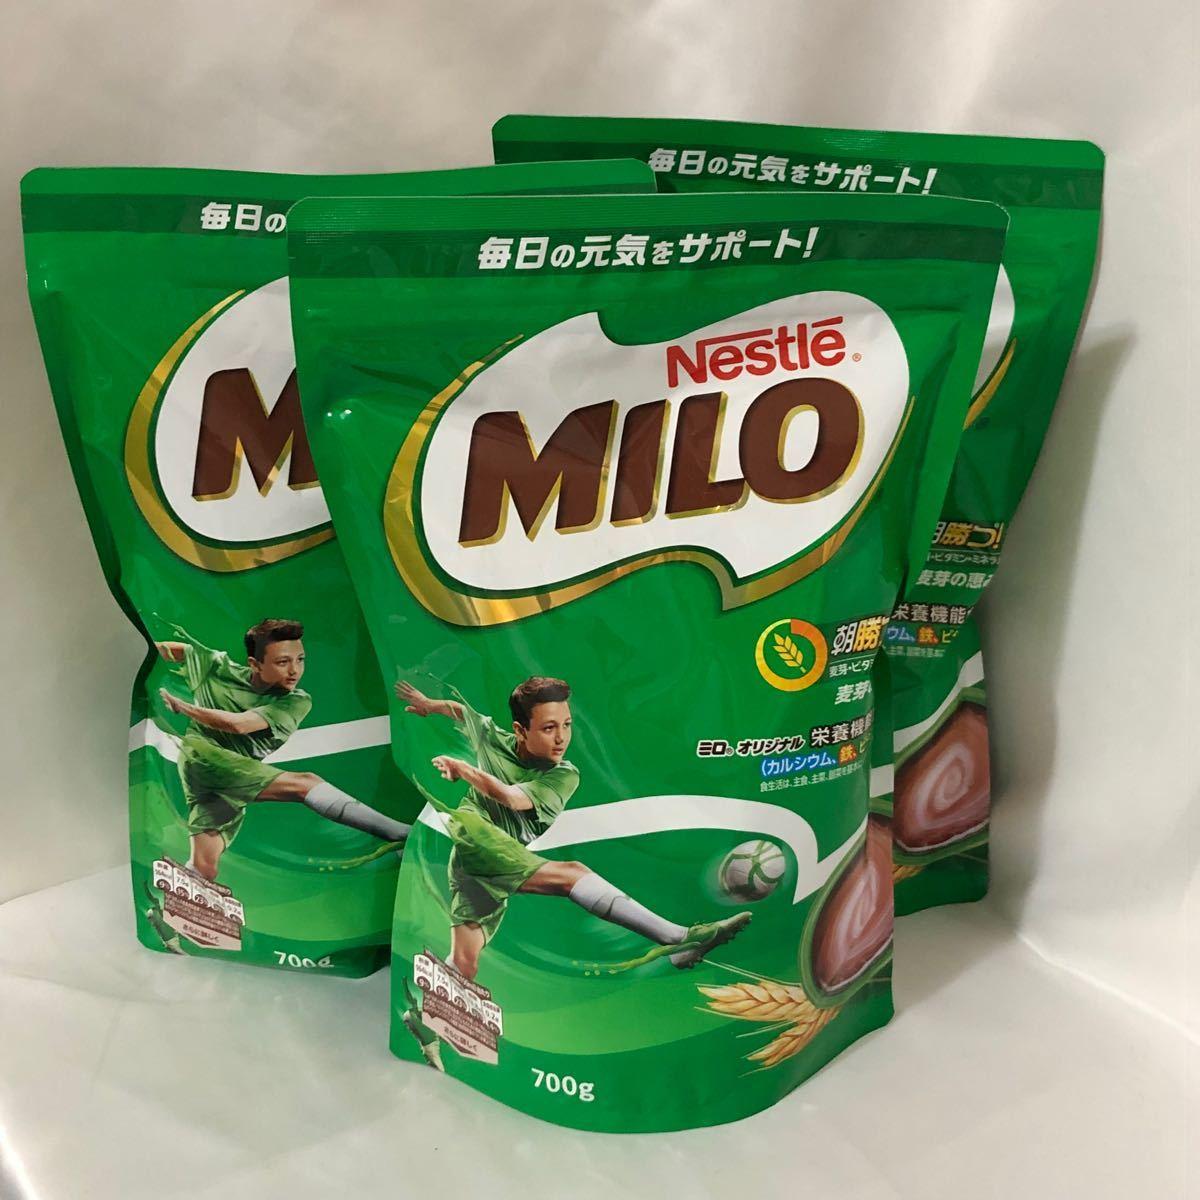 Nestle ネスレ MILO ミロ 大容量 700g パウダー ネスレミロ 3袋セット